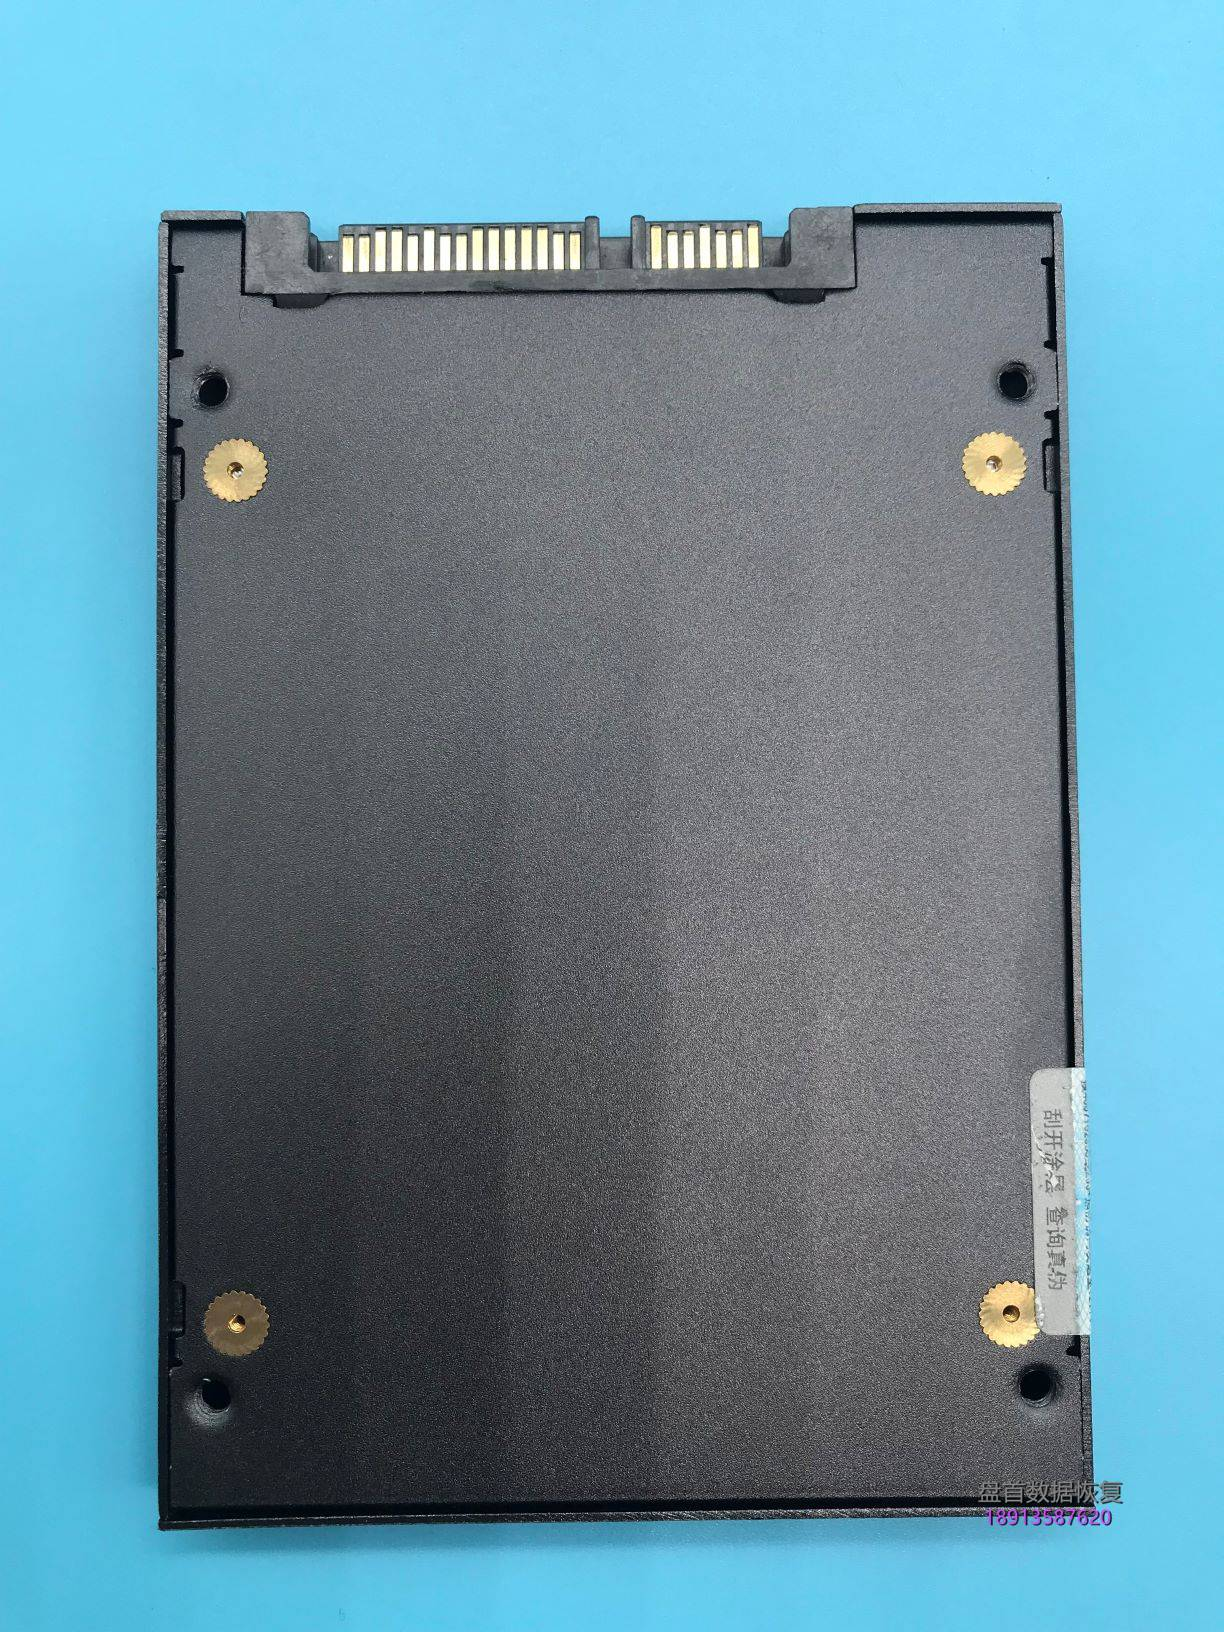 IMG_8044 光威悍将240G SSD固态突然损坏电脑开机卡死在LOGO界面无法读取硬盘里面的数据